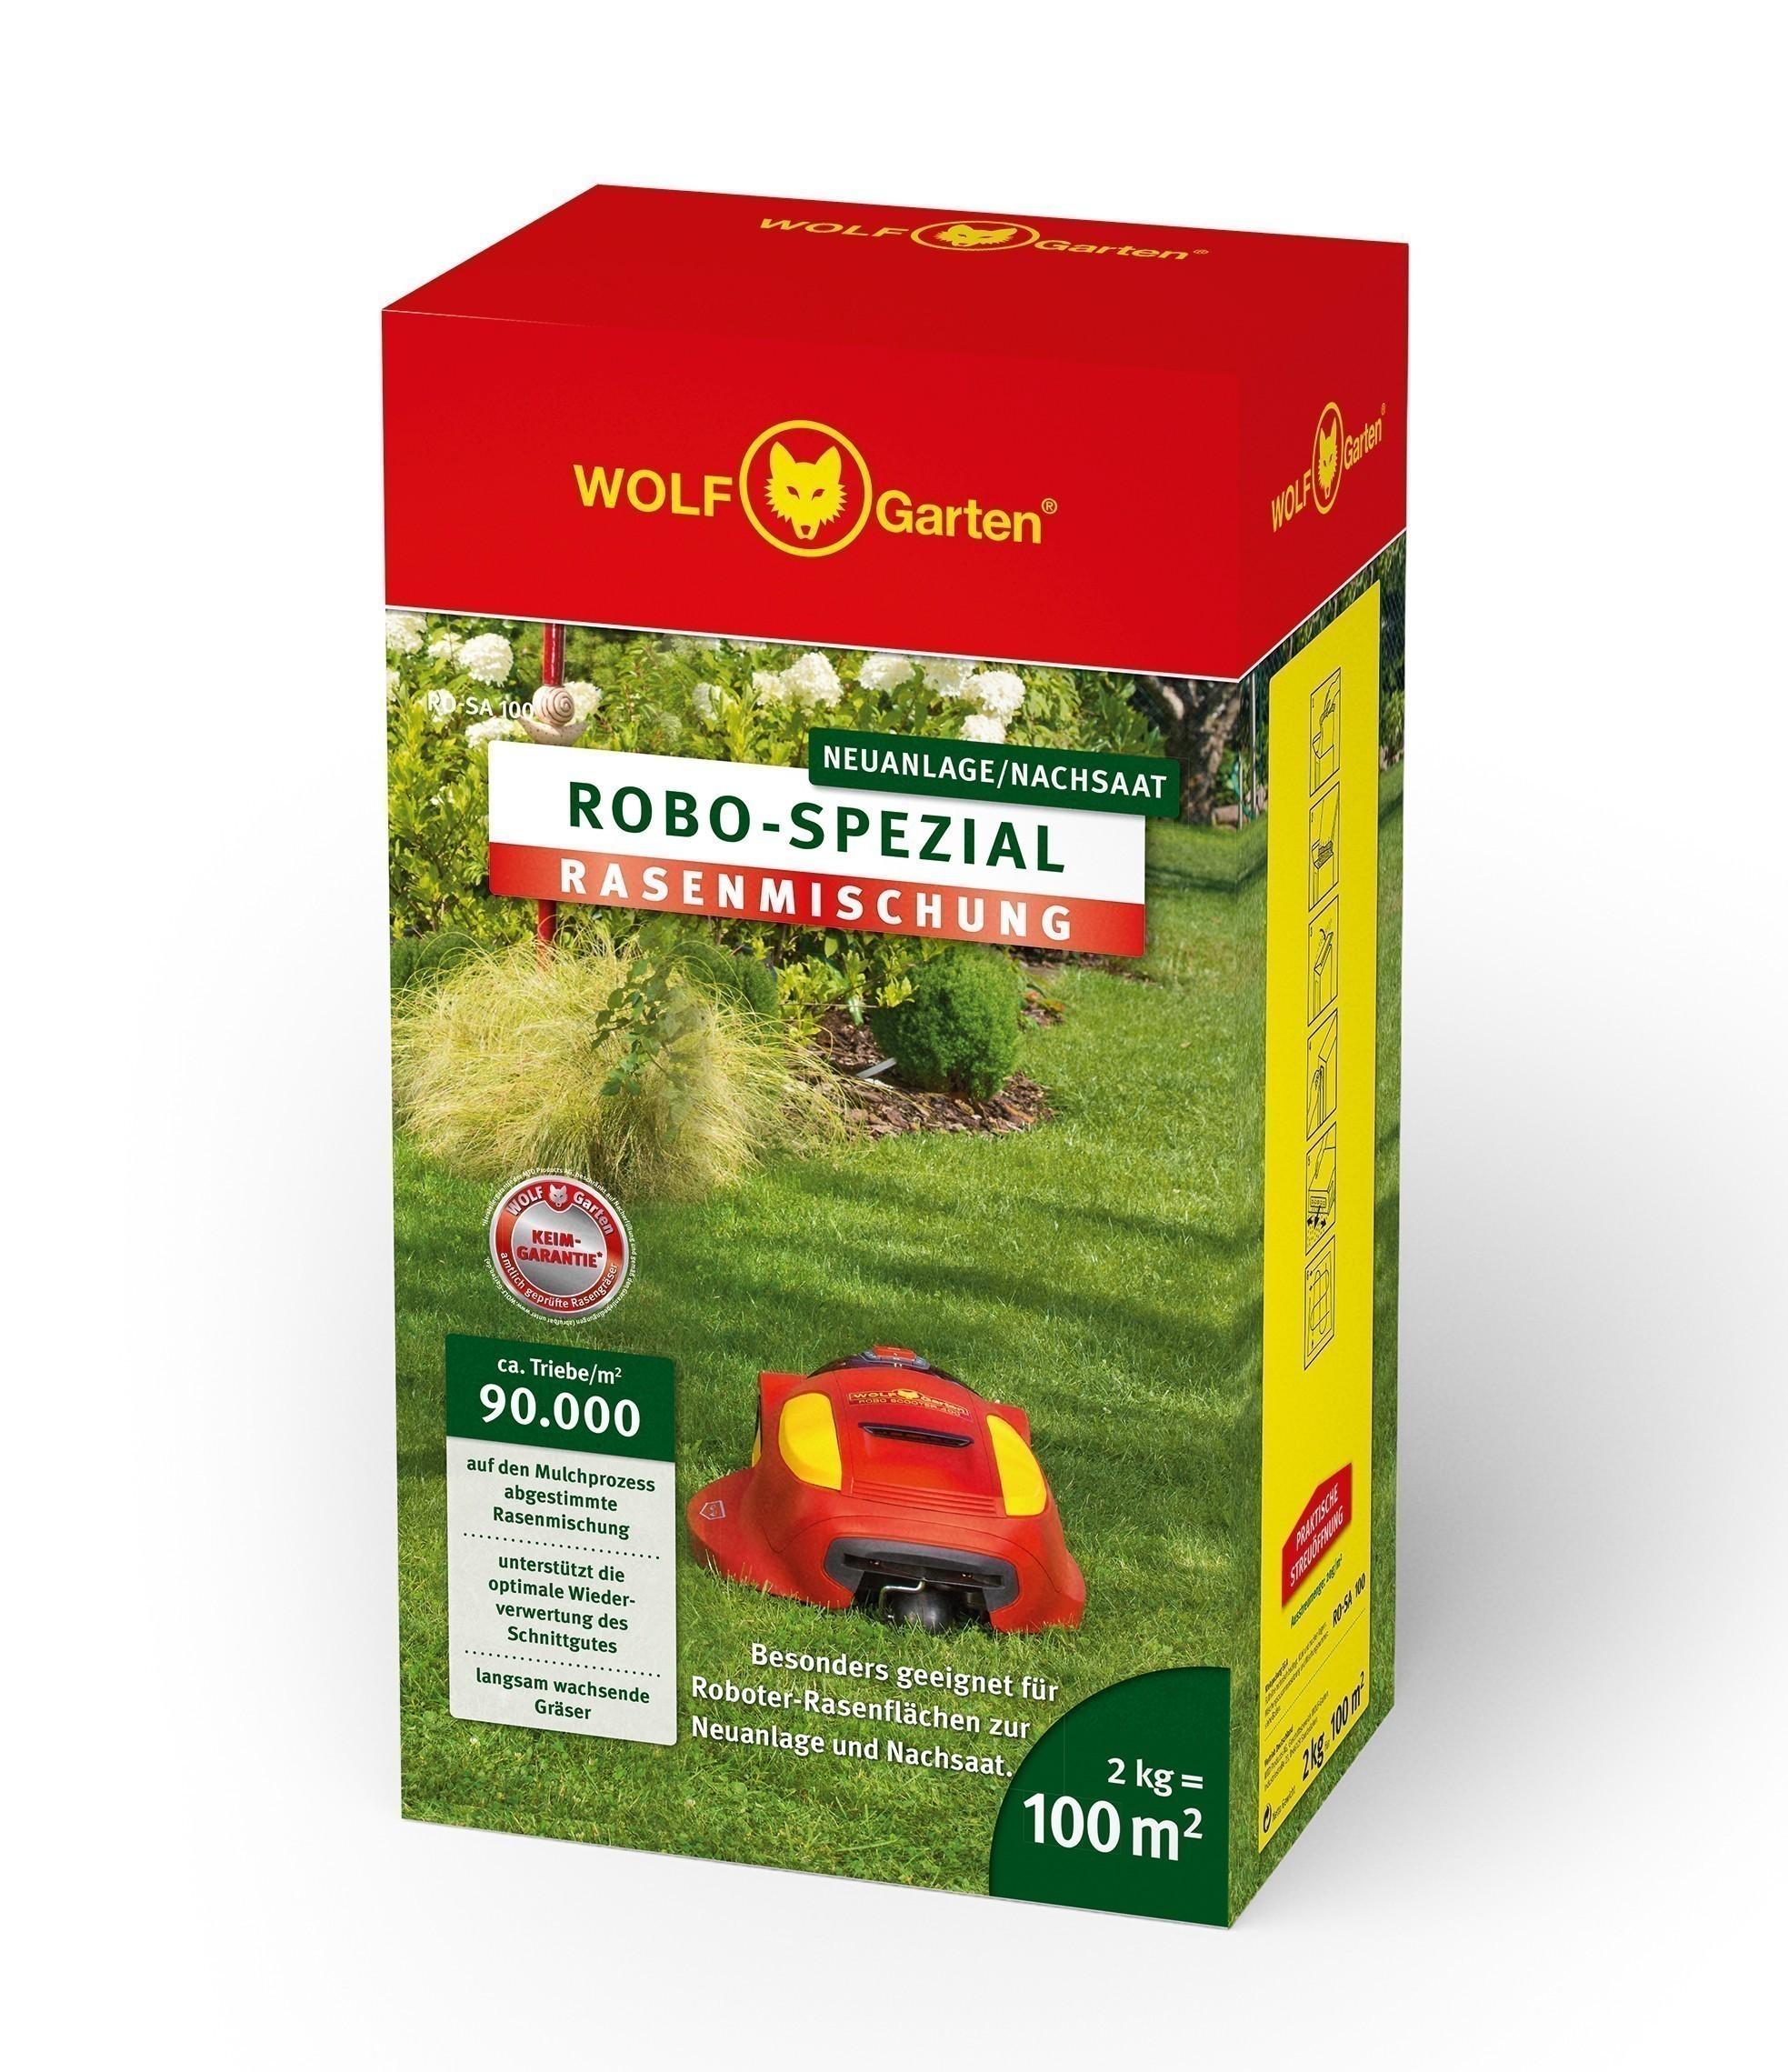 Wolf Garten Rasensamen Saatgut Robo Spezial RO-SA 100 für 100m² Bild 1